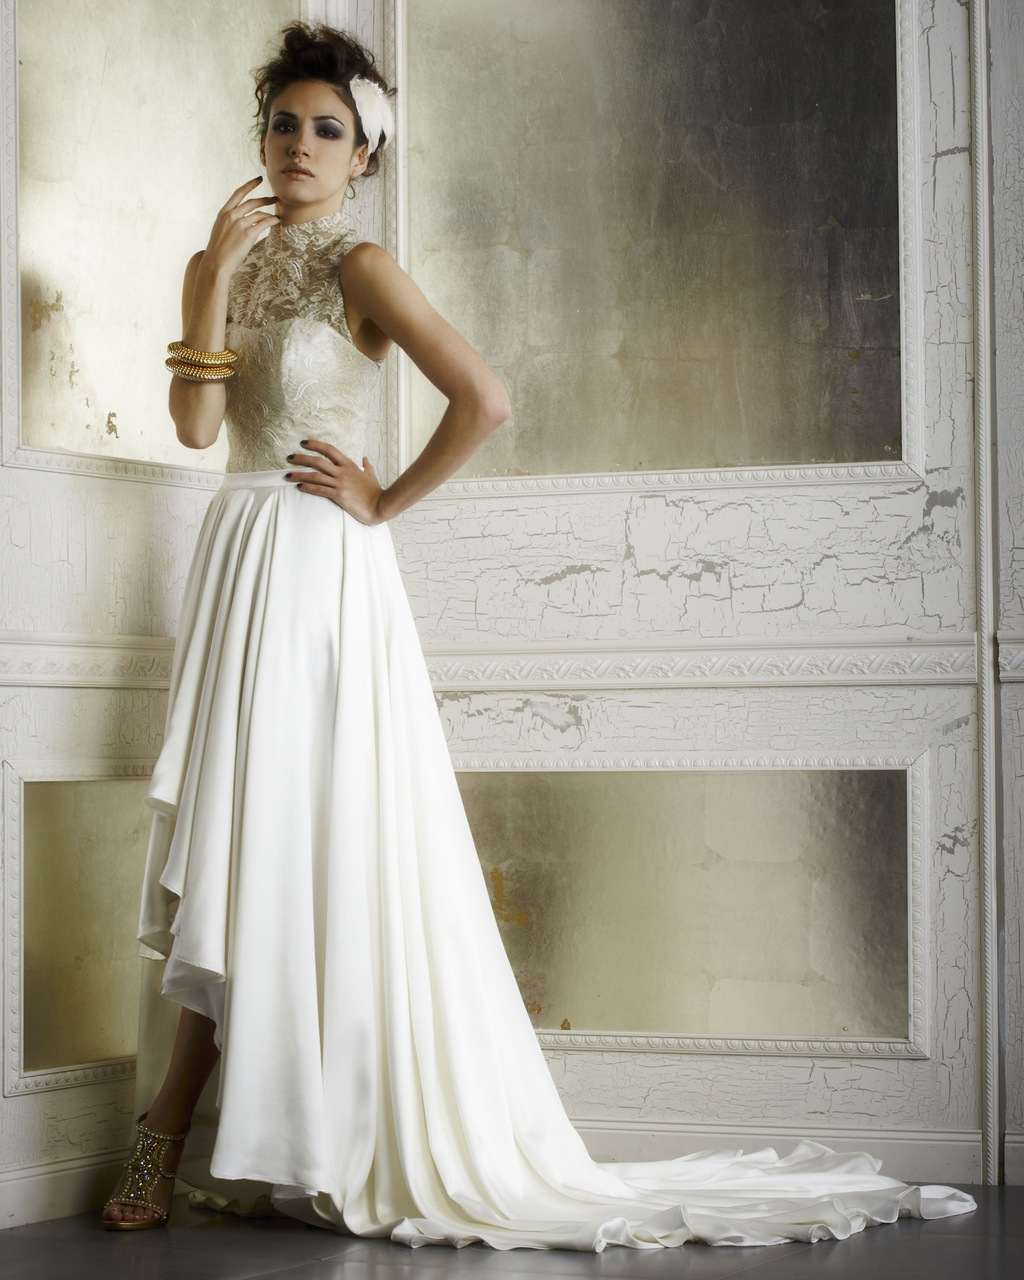 Della_giovanna_alexis_corset_and_aaron_skirt.full